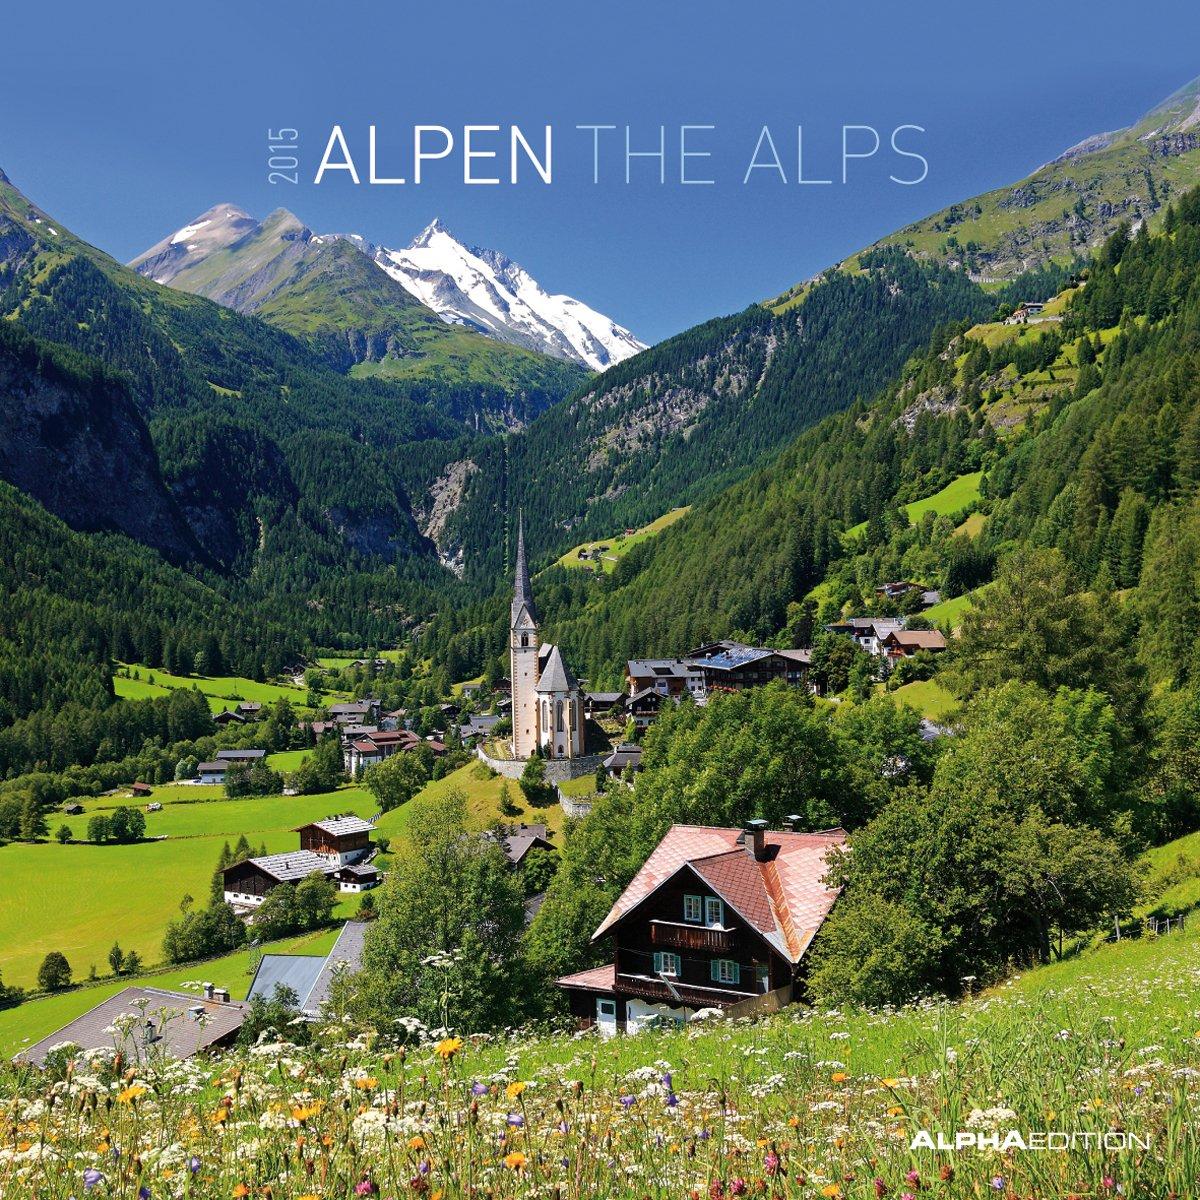 Alpen 2015 - The Alps - Broschürenkalender (30 x 60 geöffnet) - Landschaftskalender